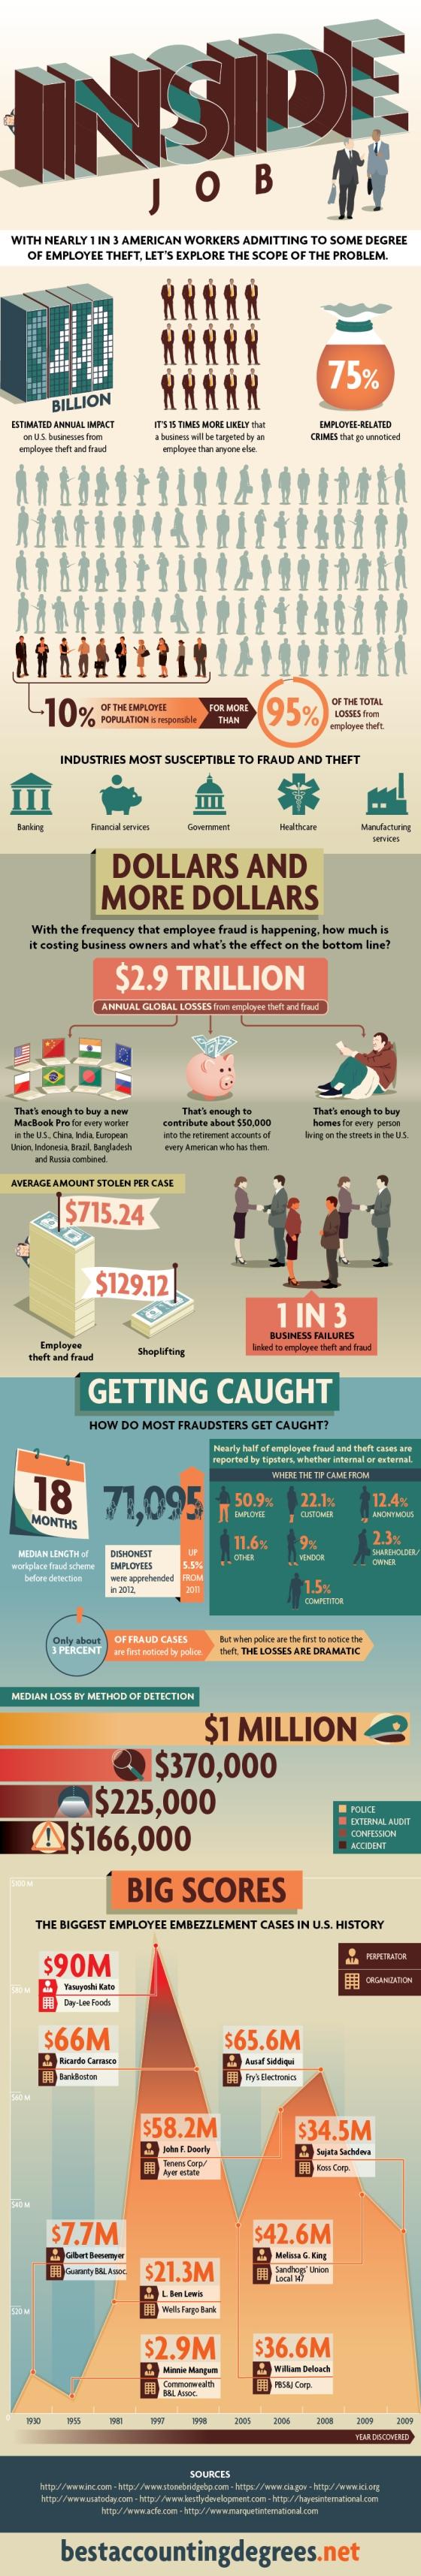 Infographic : Employee Theft